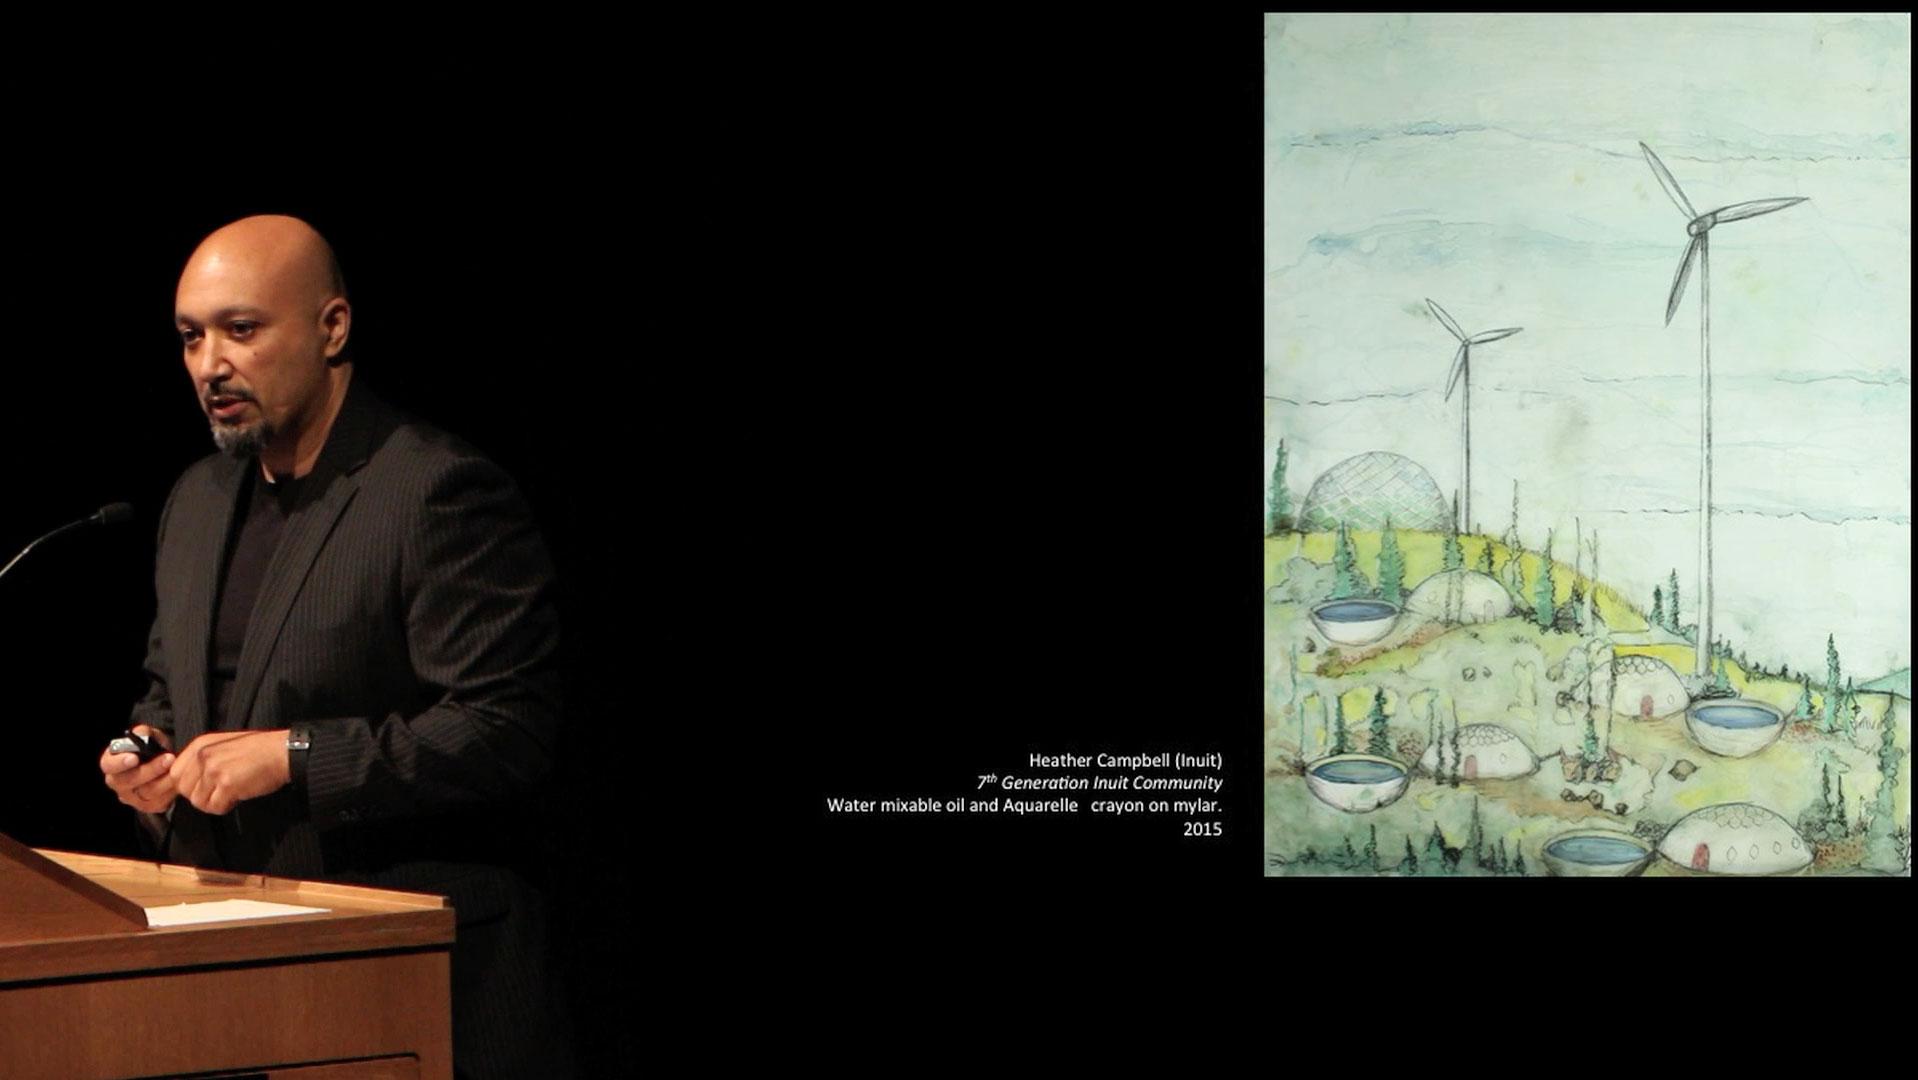 Video still of Jason Edward Lewis from the Walrus Talks Play